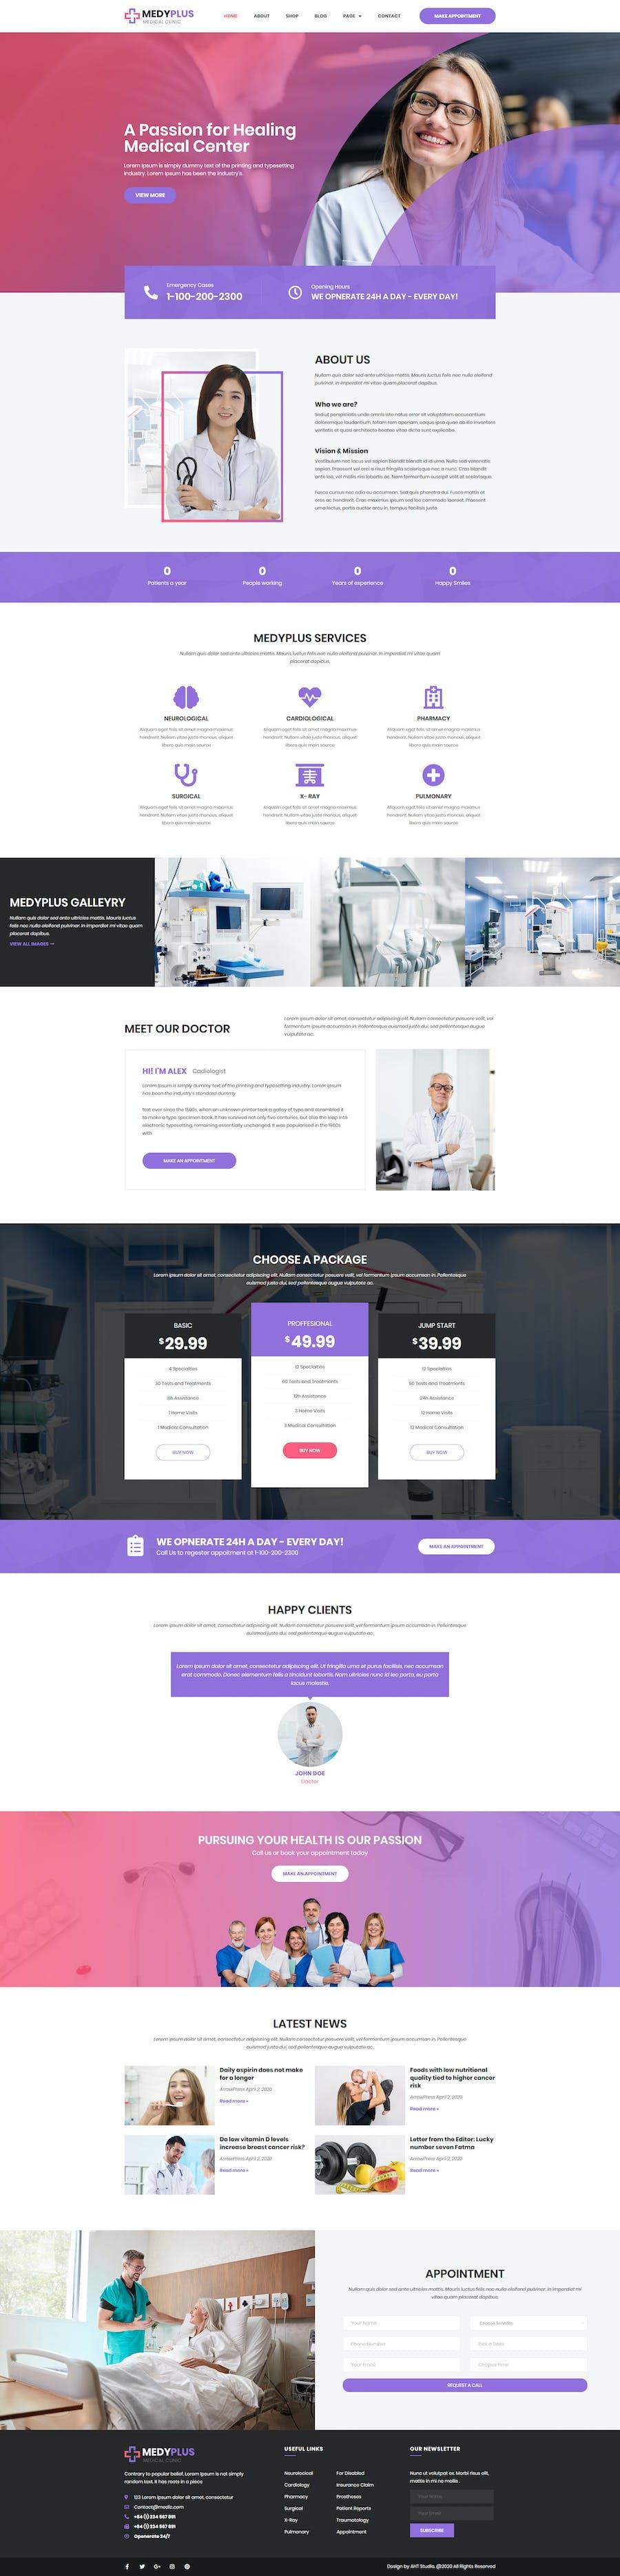 Medyplus - Medical, Clinic Template Kit - 1